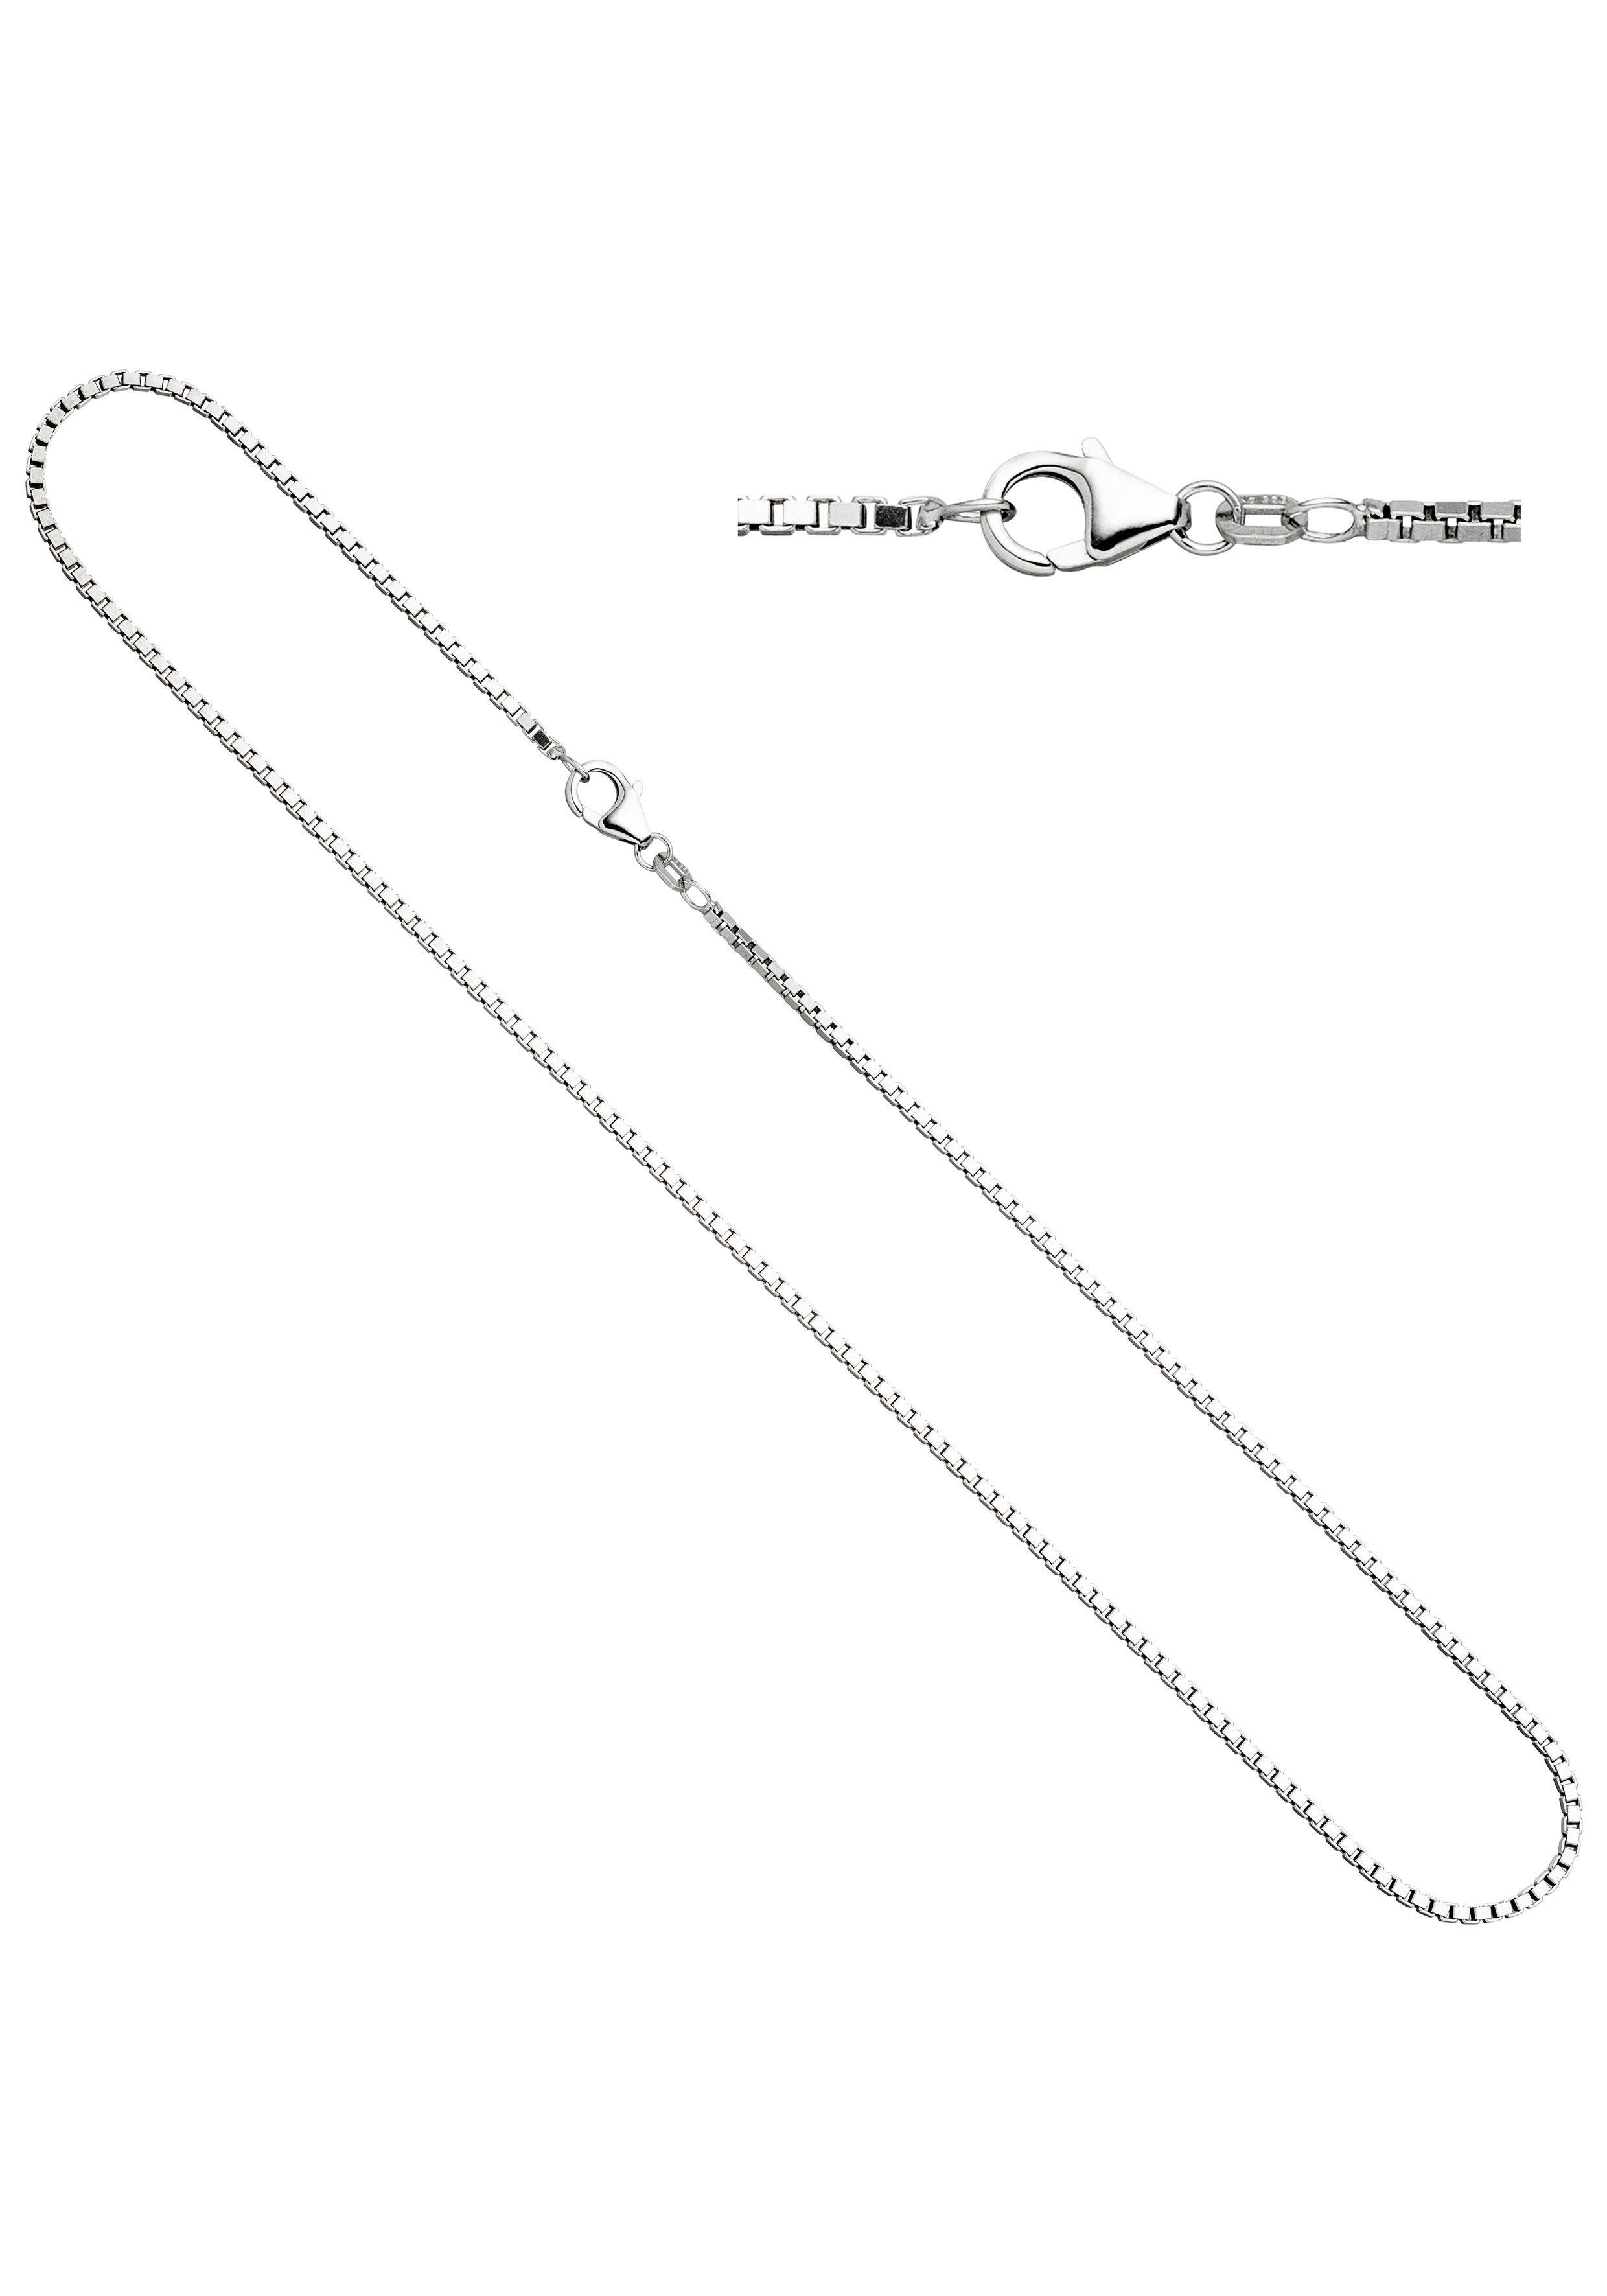 JOBO Silberkette Venezianerkette 925 Silber 45 cm 1,8 mm